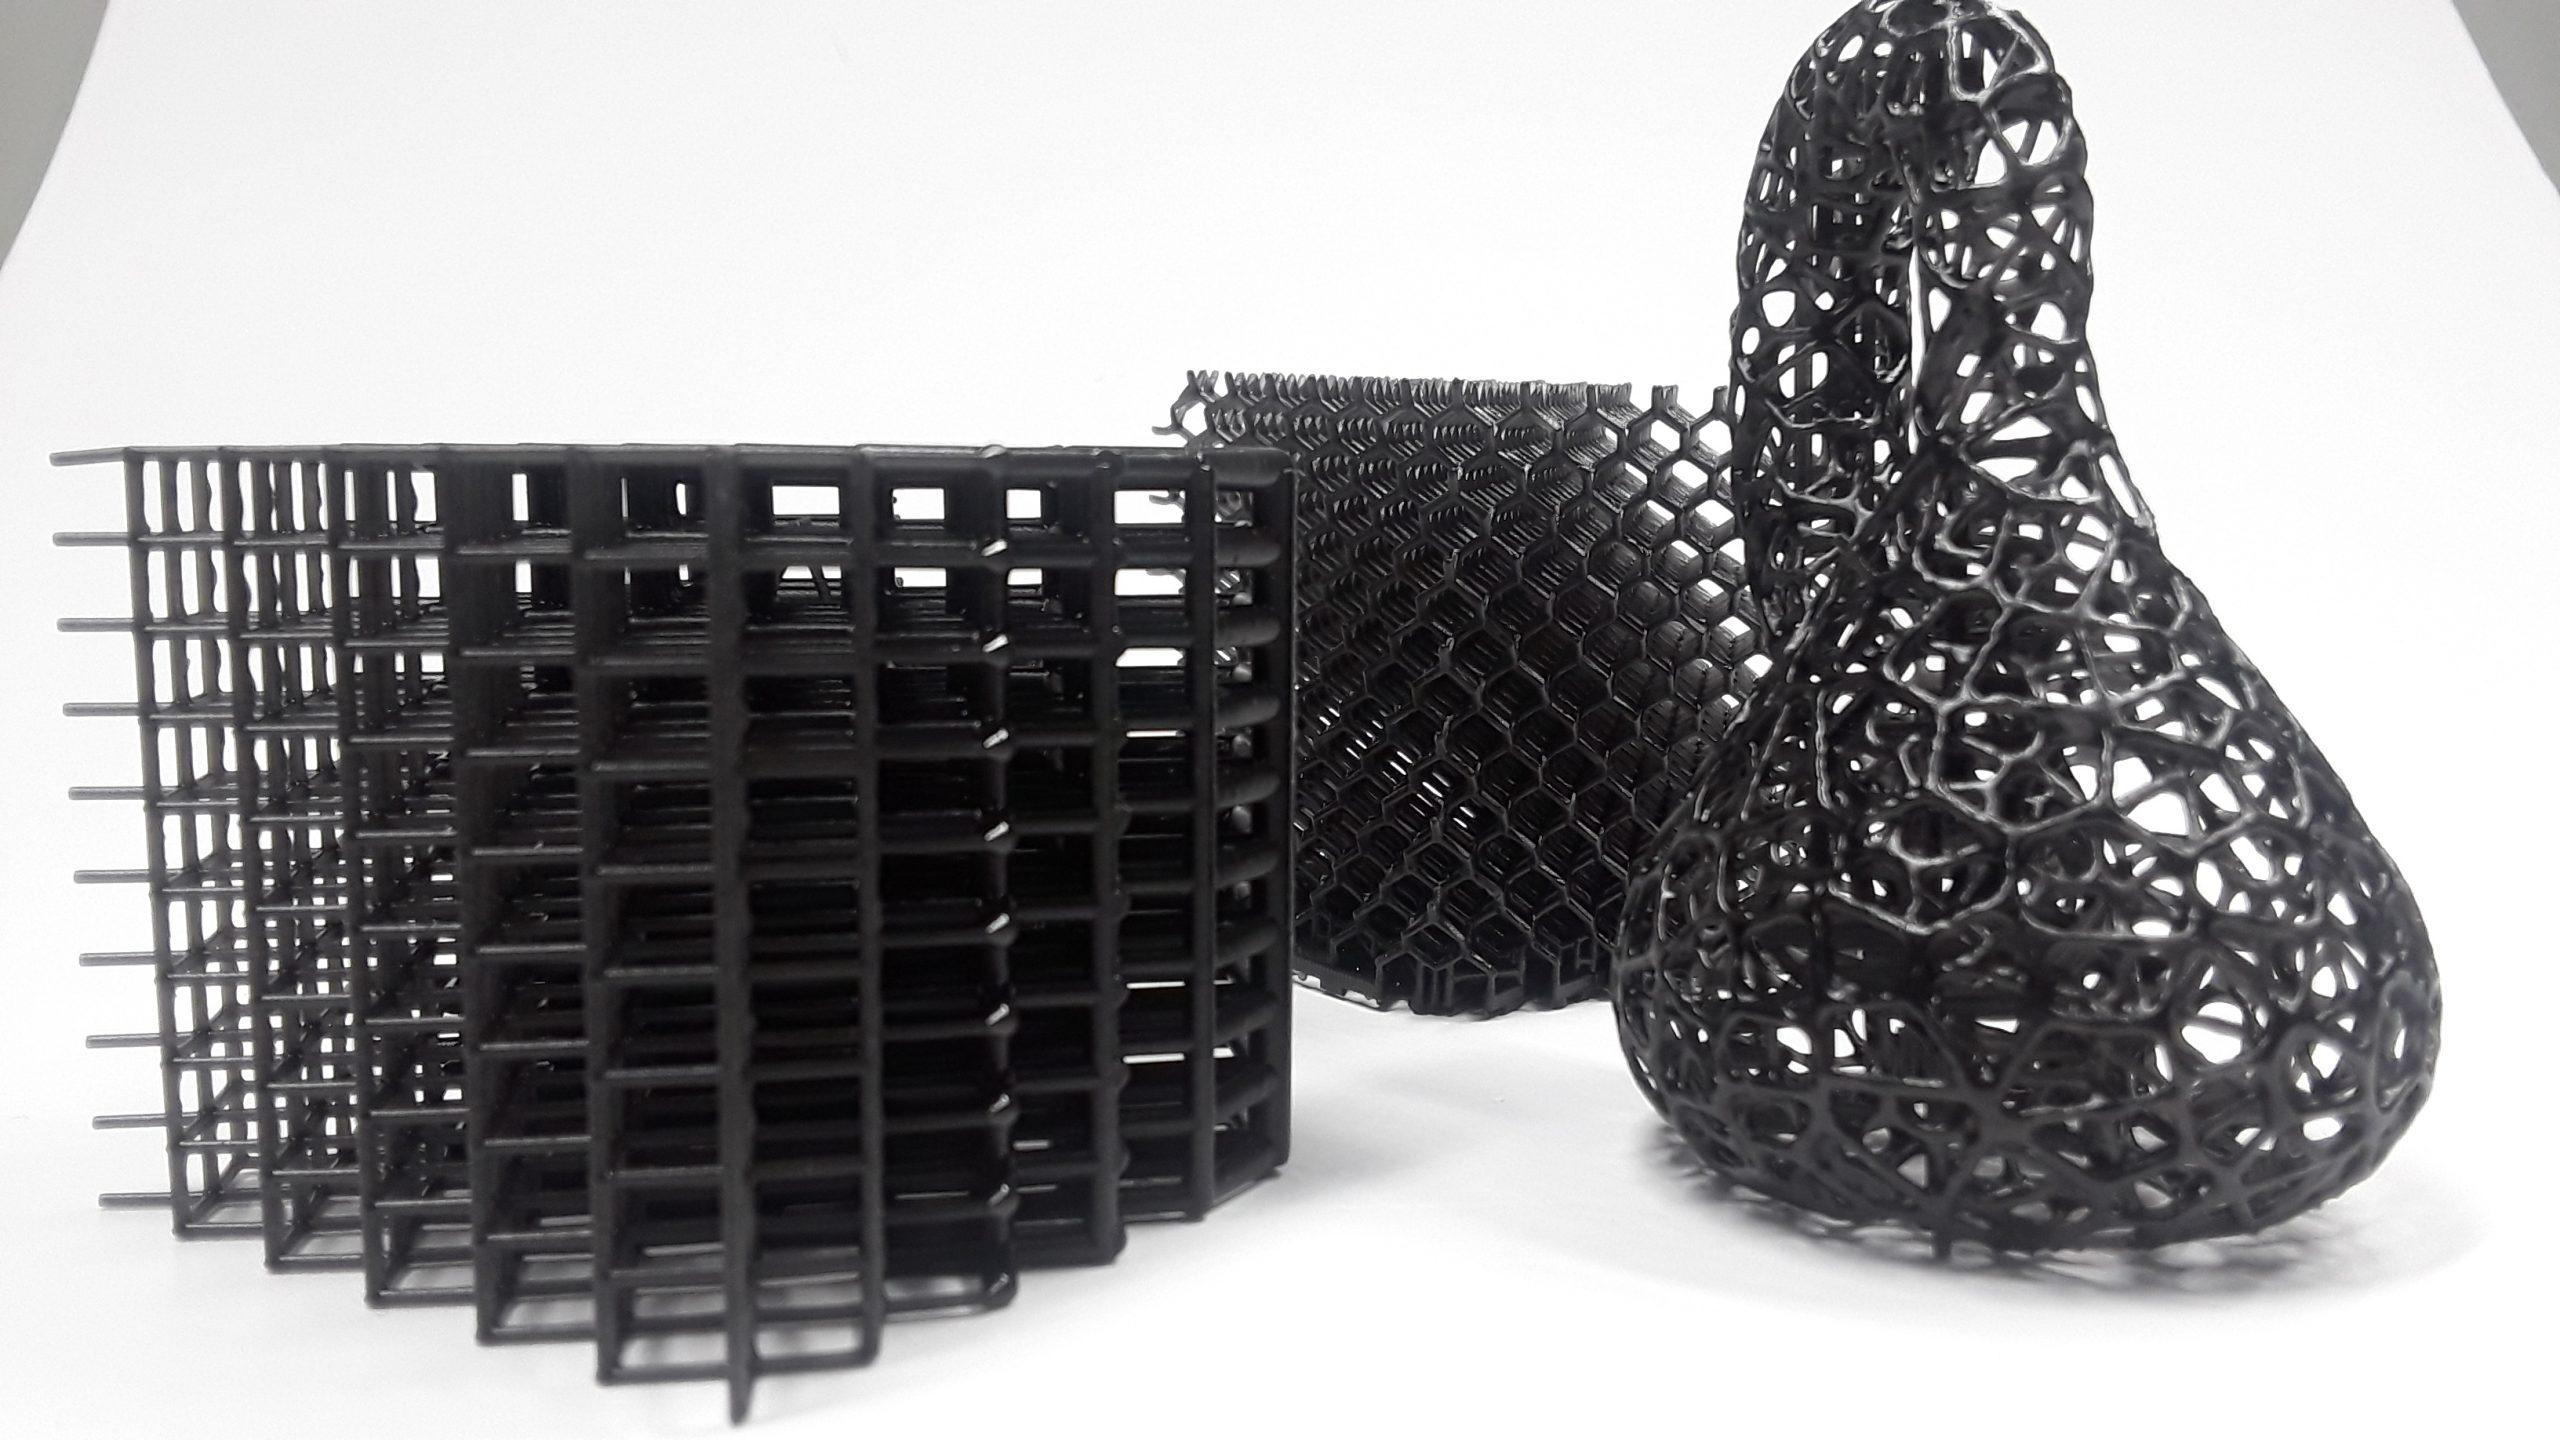 Resin 3D printed parts Figure 4 3D printer